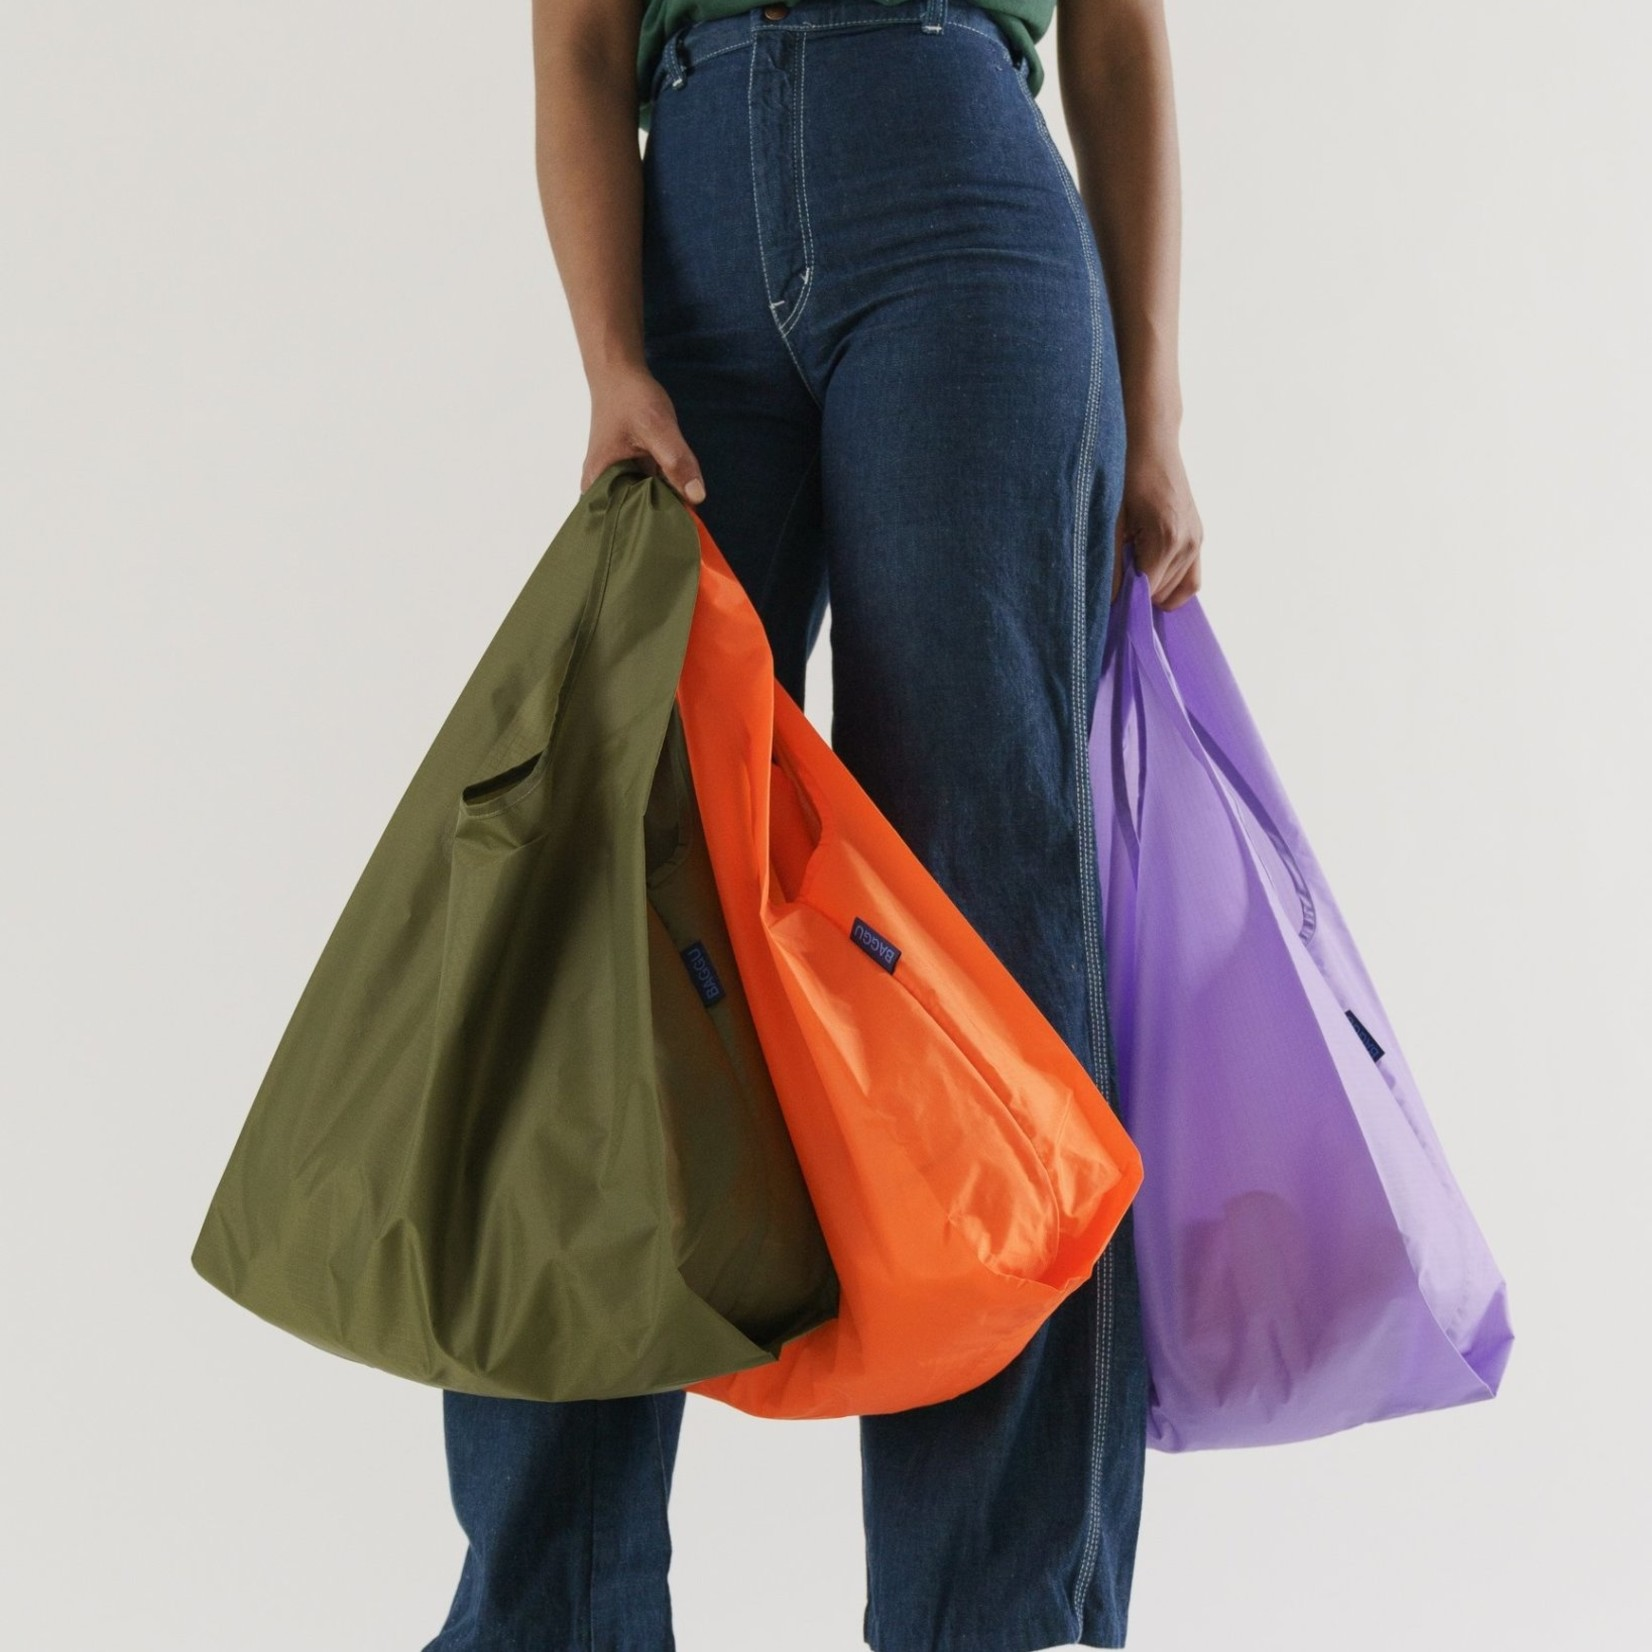 Baggu Baggu Reusable Bag Standard Meadow Set of Three